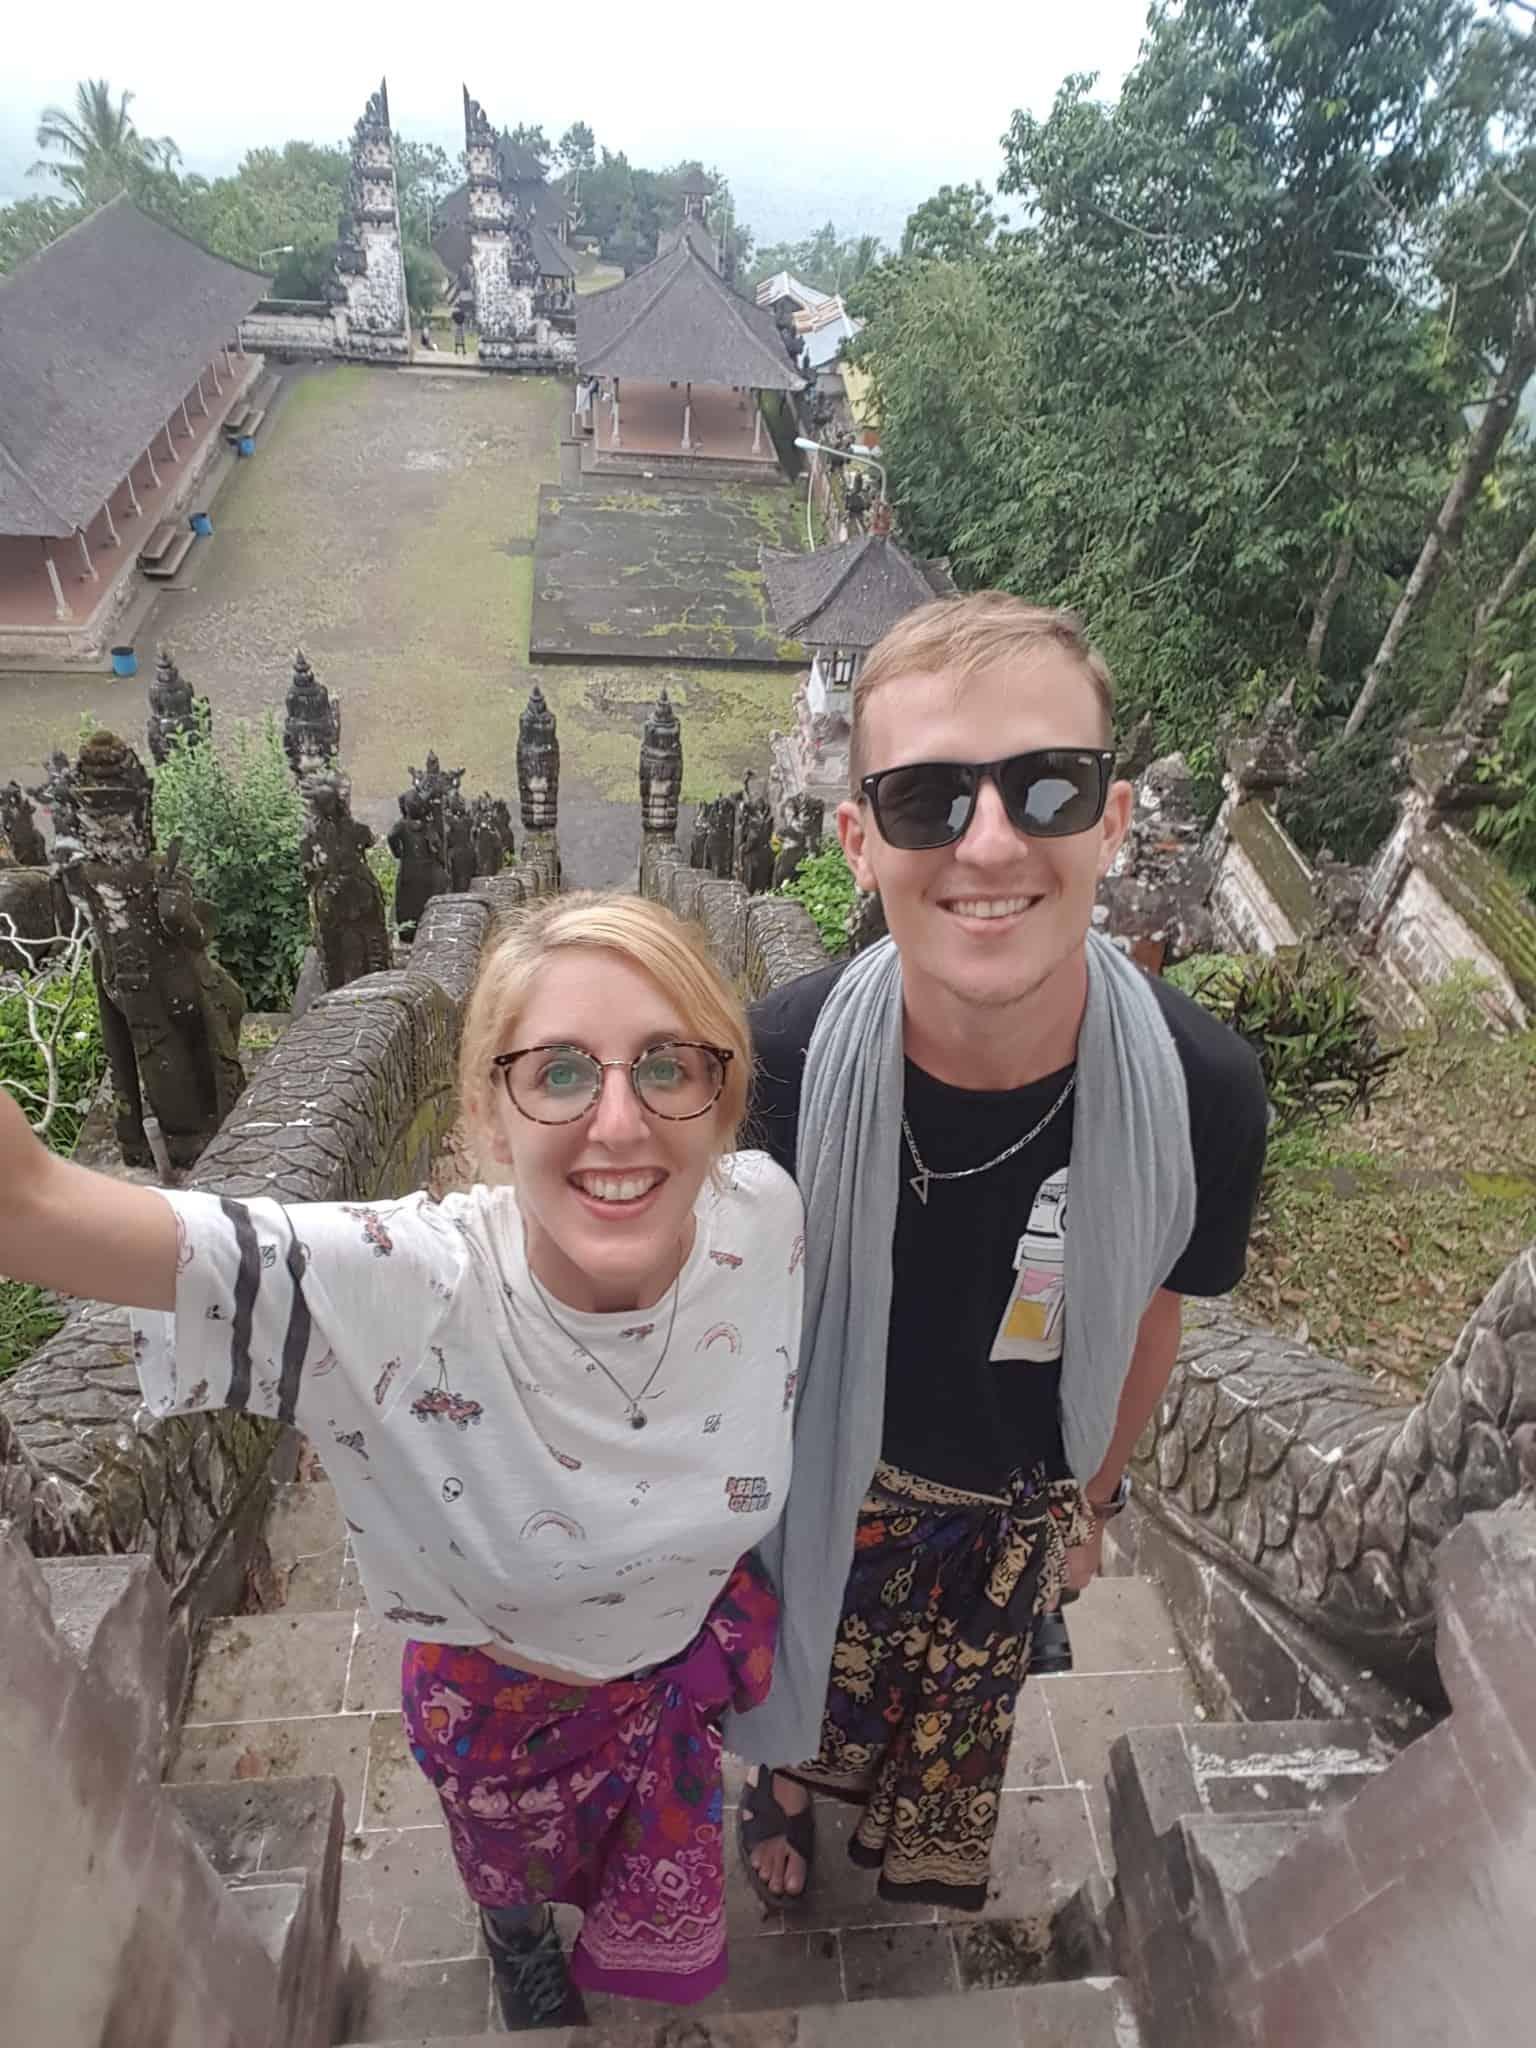 Bali, l'incroyable vue du temple Pura Lempuyang Luhur 🌋 7